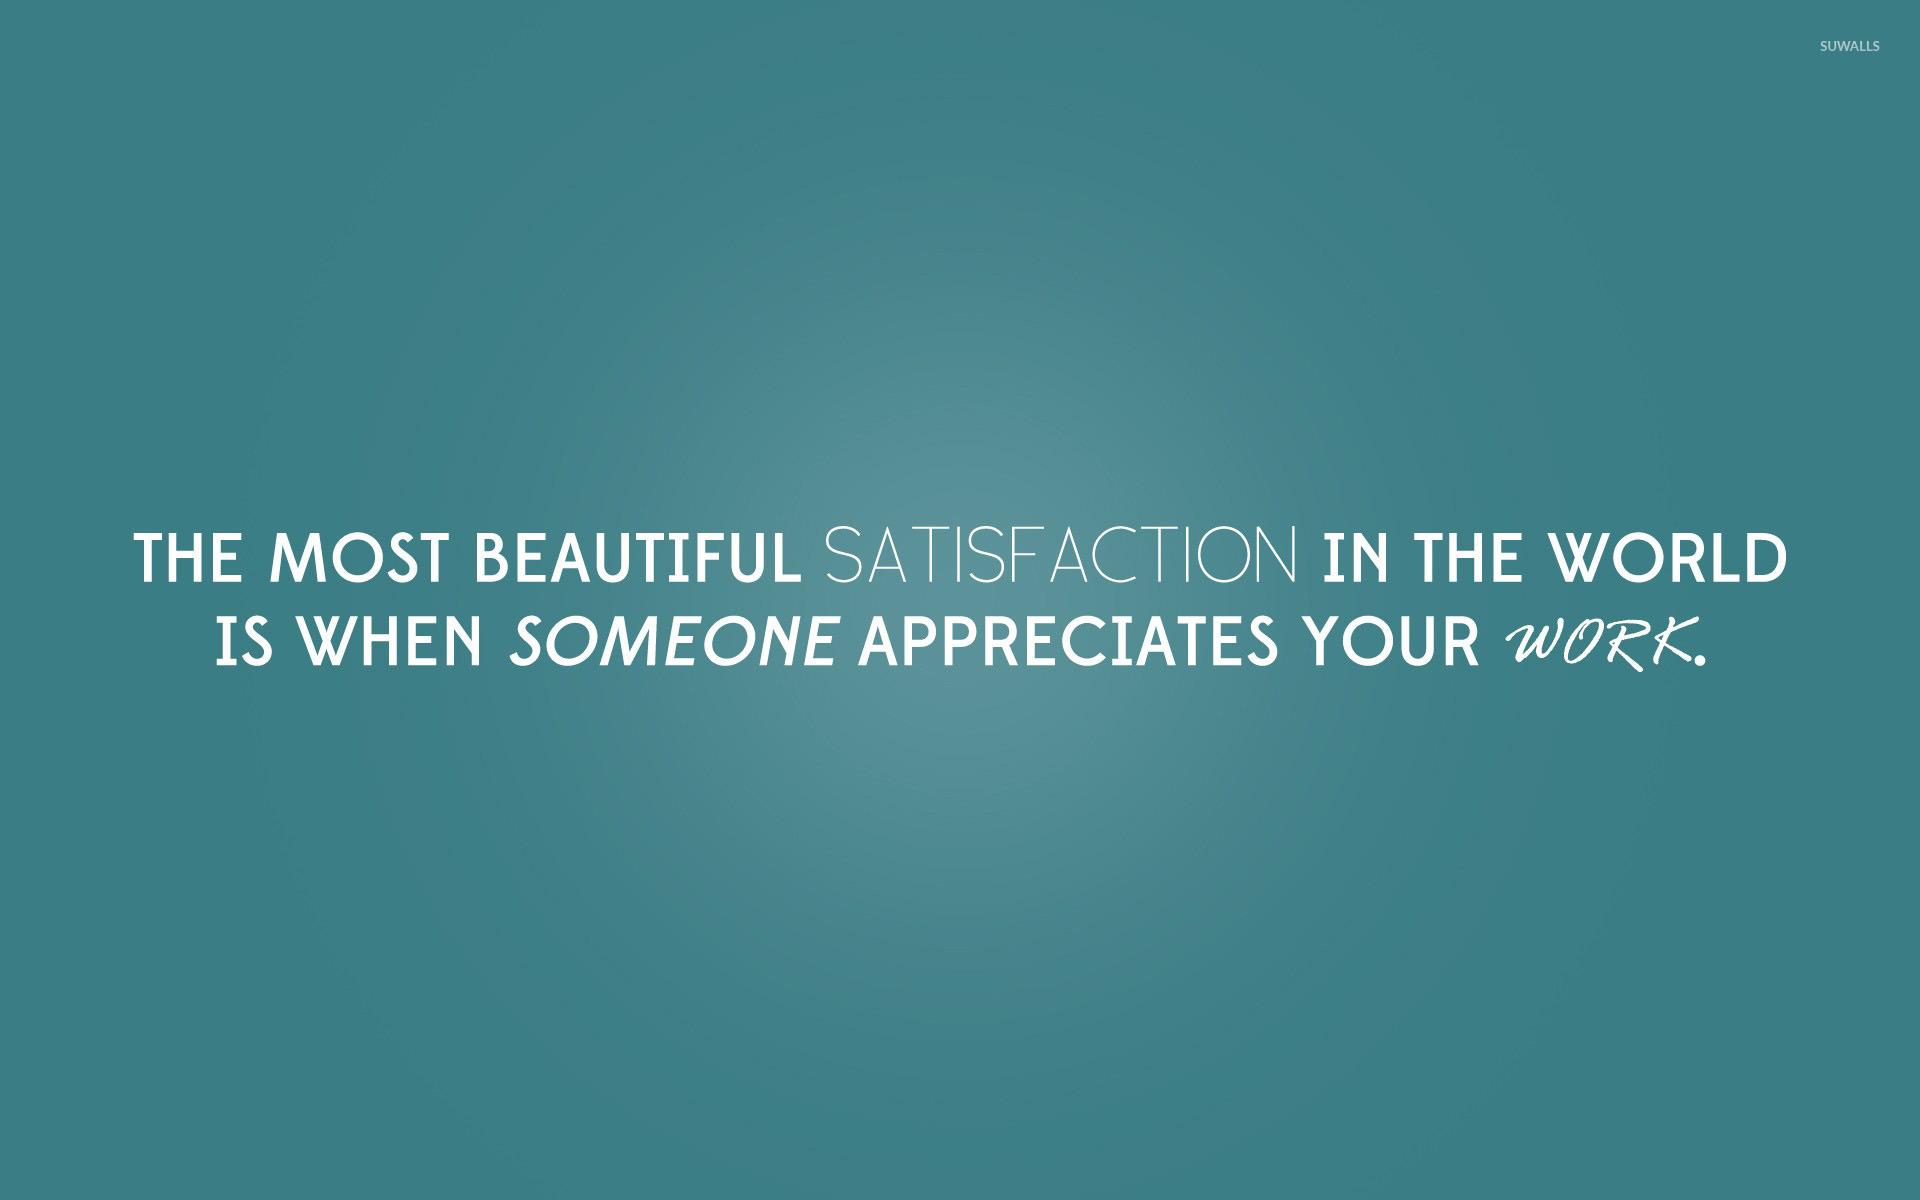 do your work typography  someone appreciates your work 1920x1200 jpg